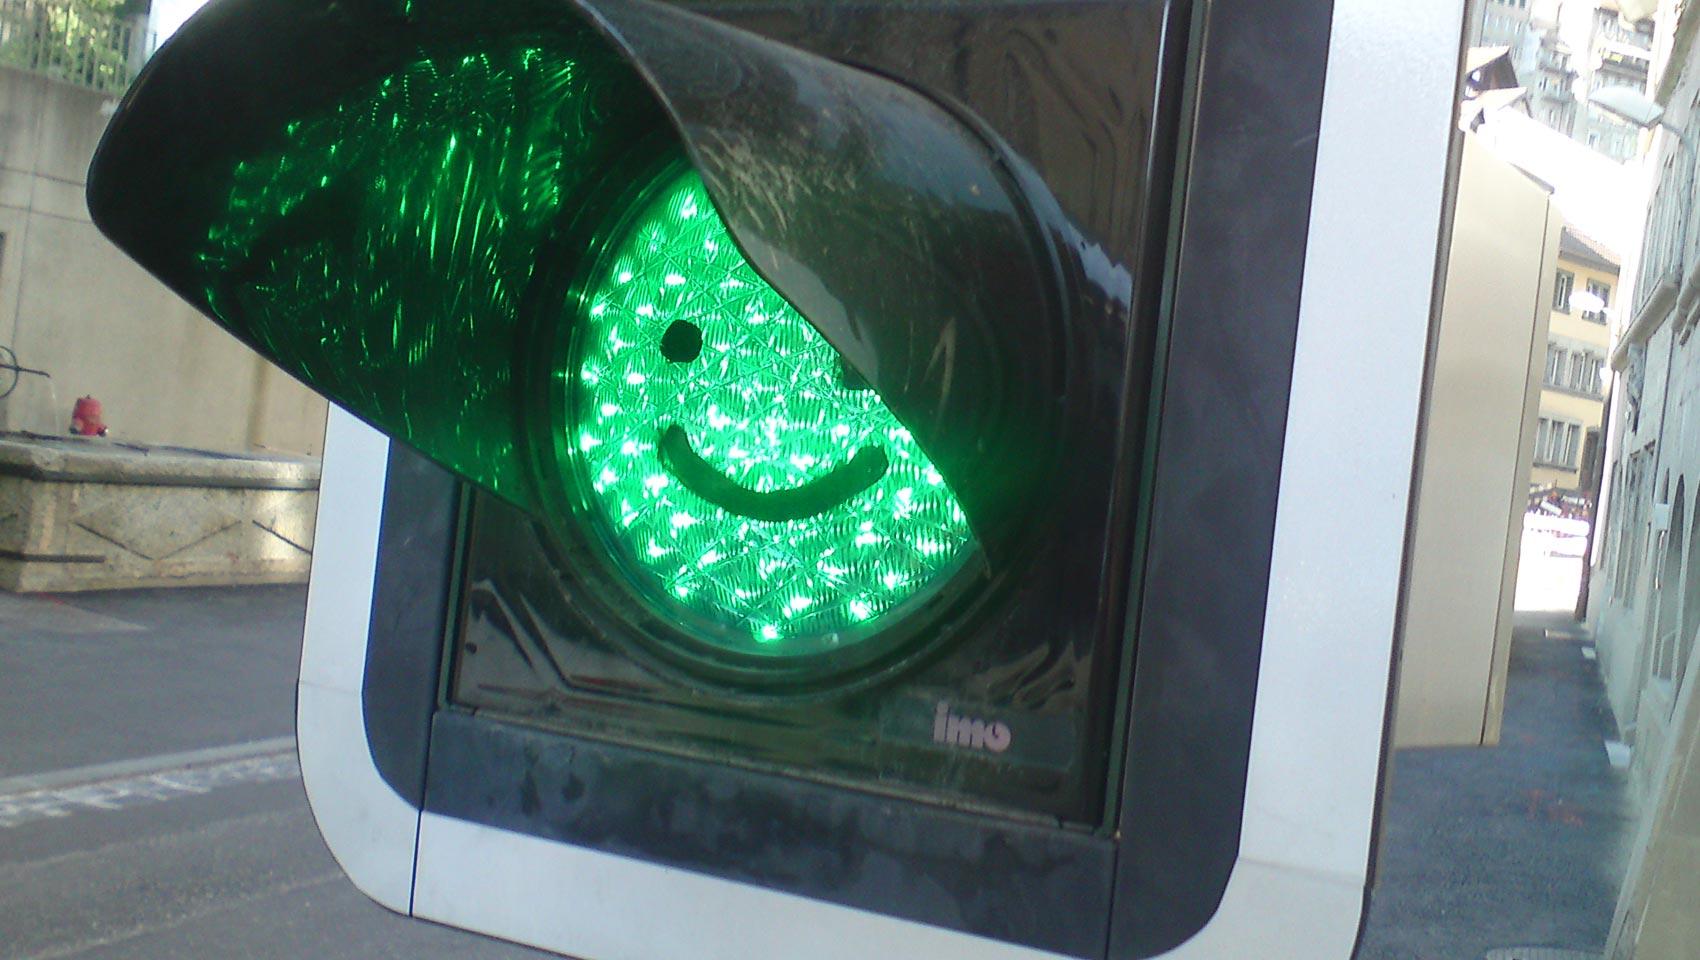 Das lustige Ampel-Smiley.